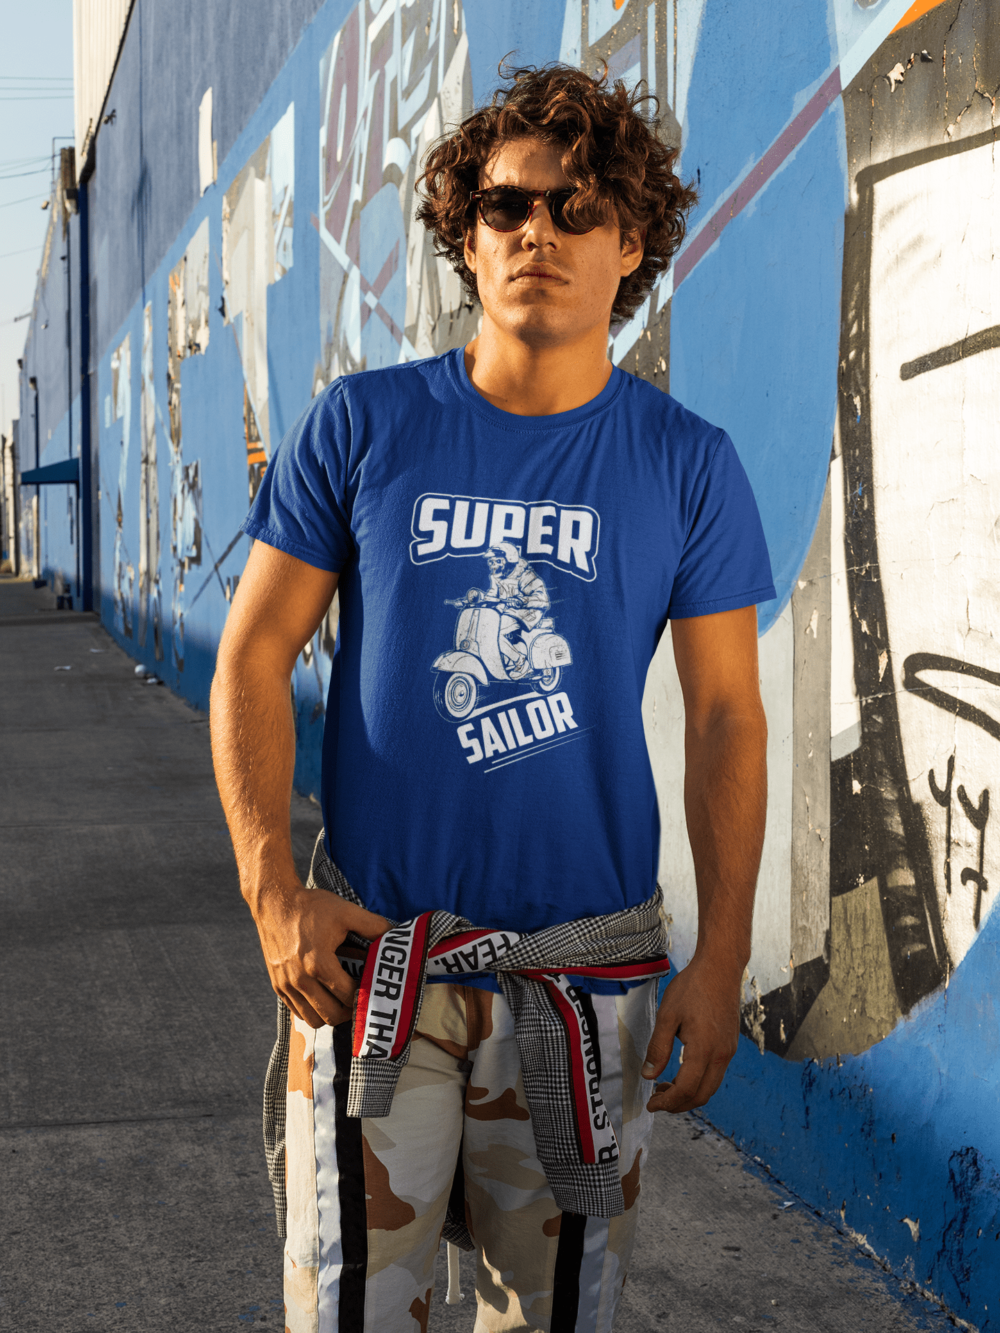 Super Sailor Graphic Printed T shirt